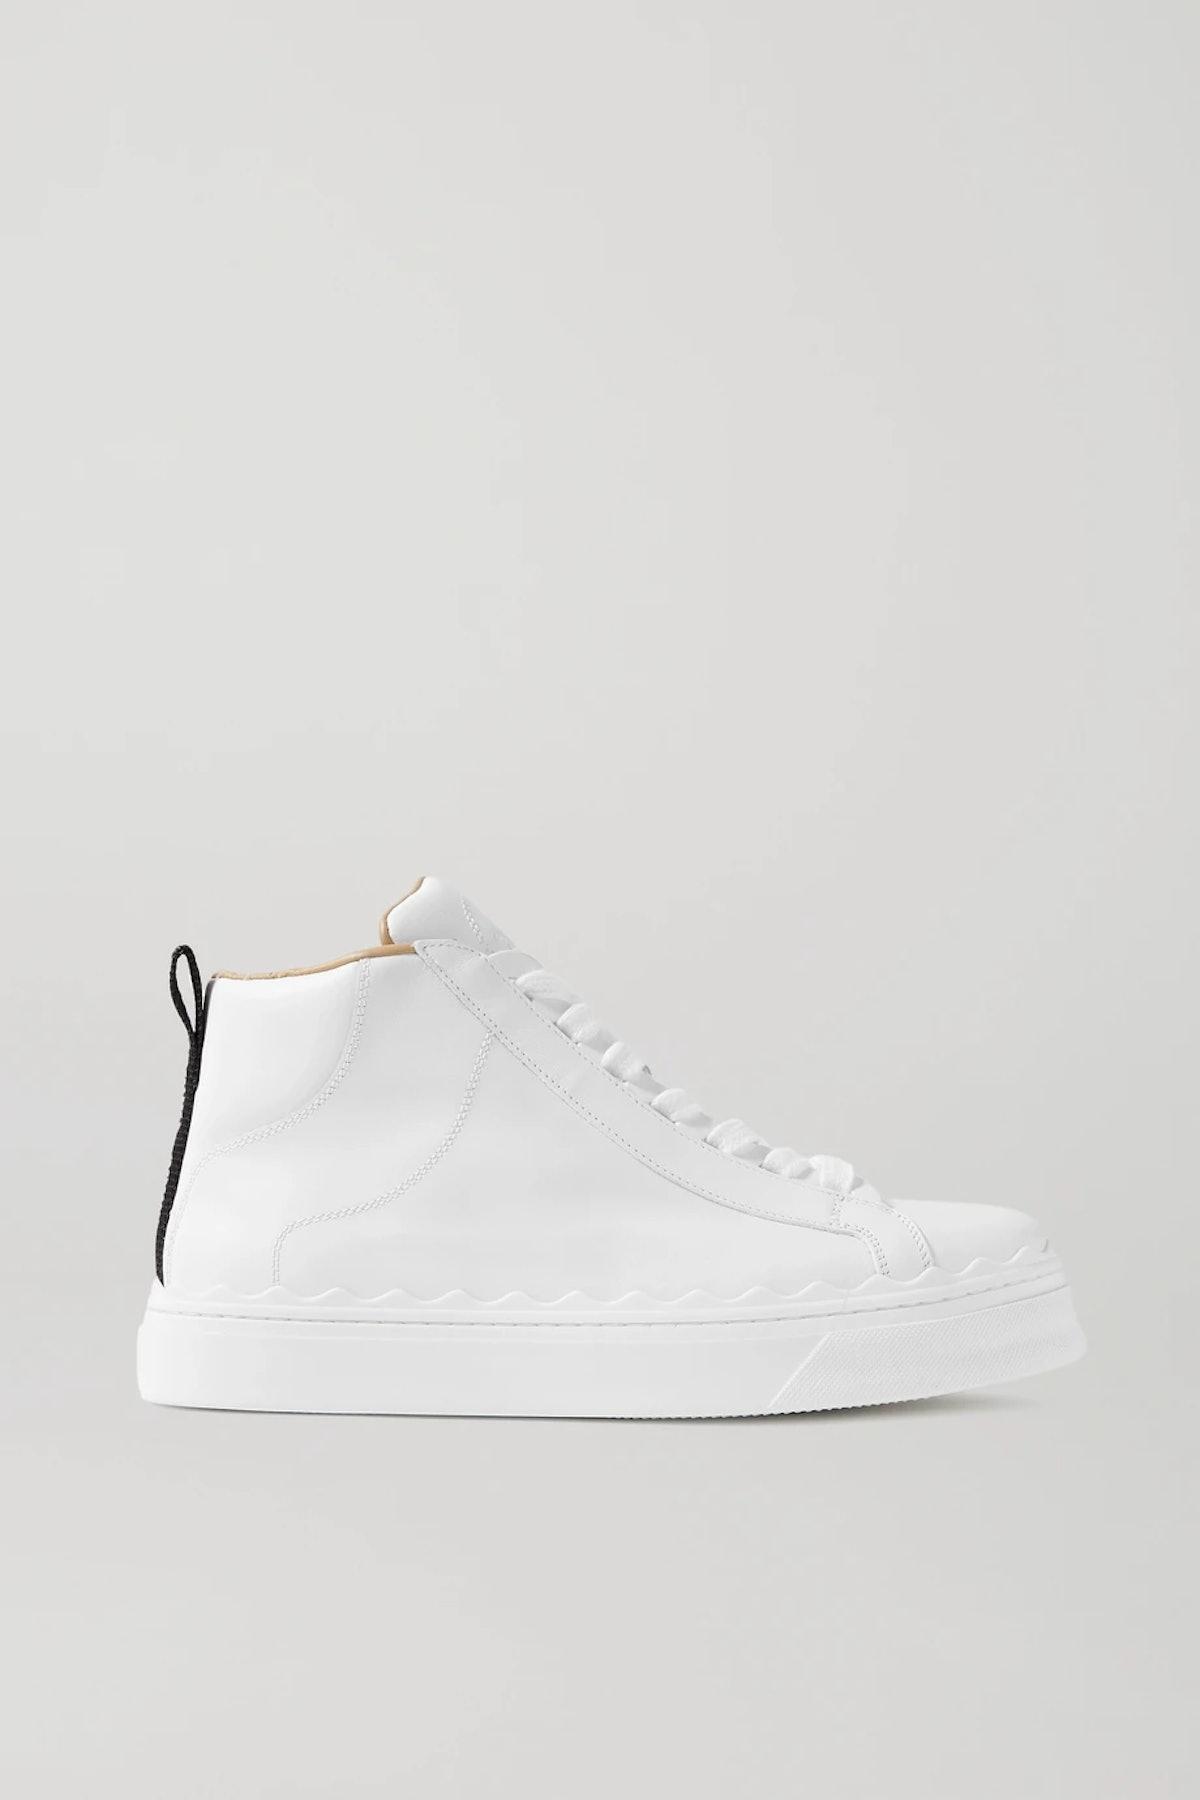 Lauren Scalloped Leather High-Top Sneakers